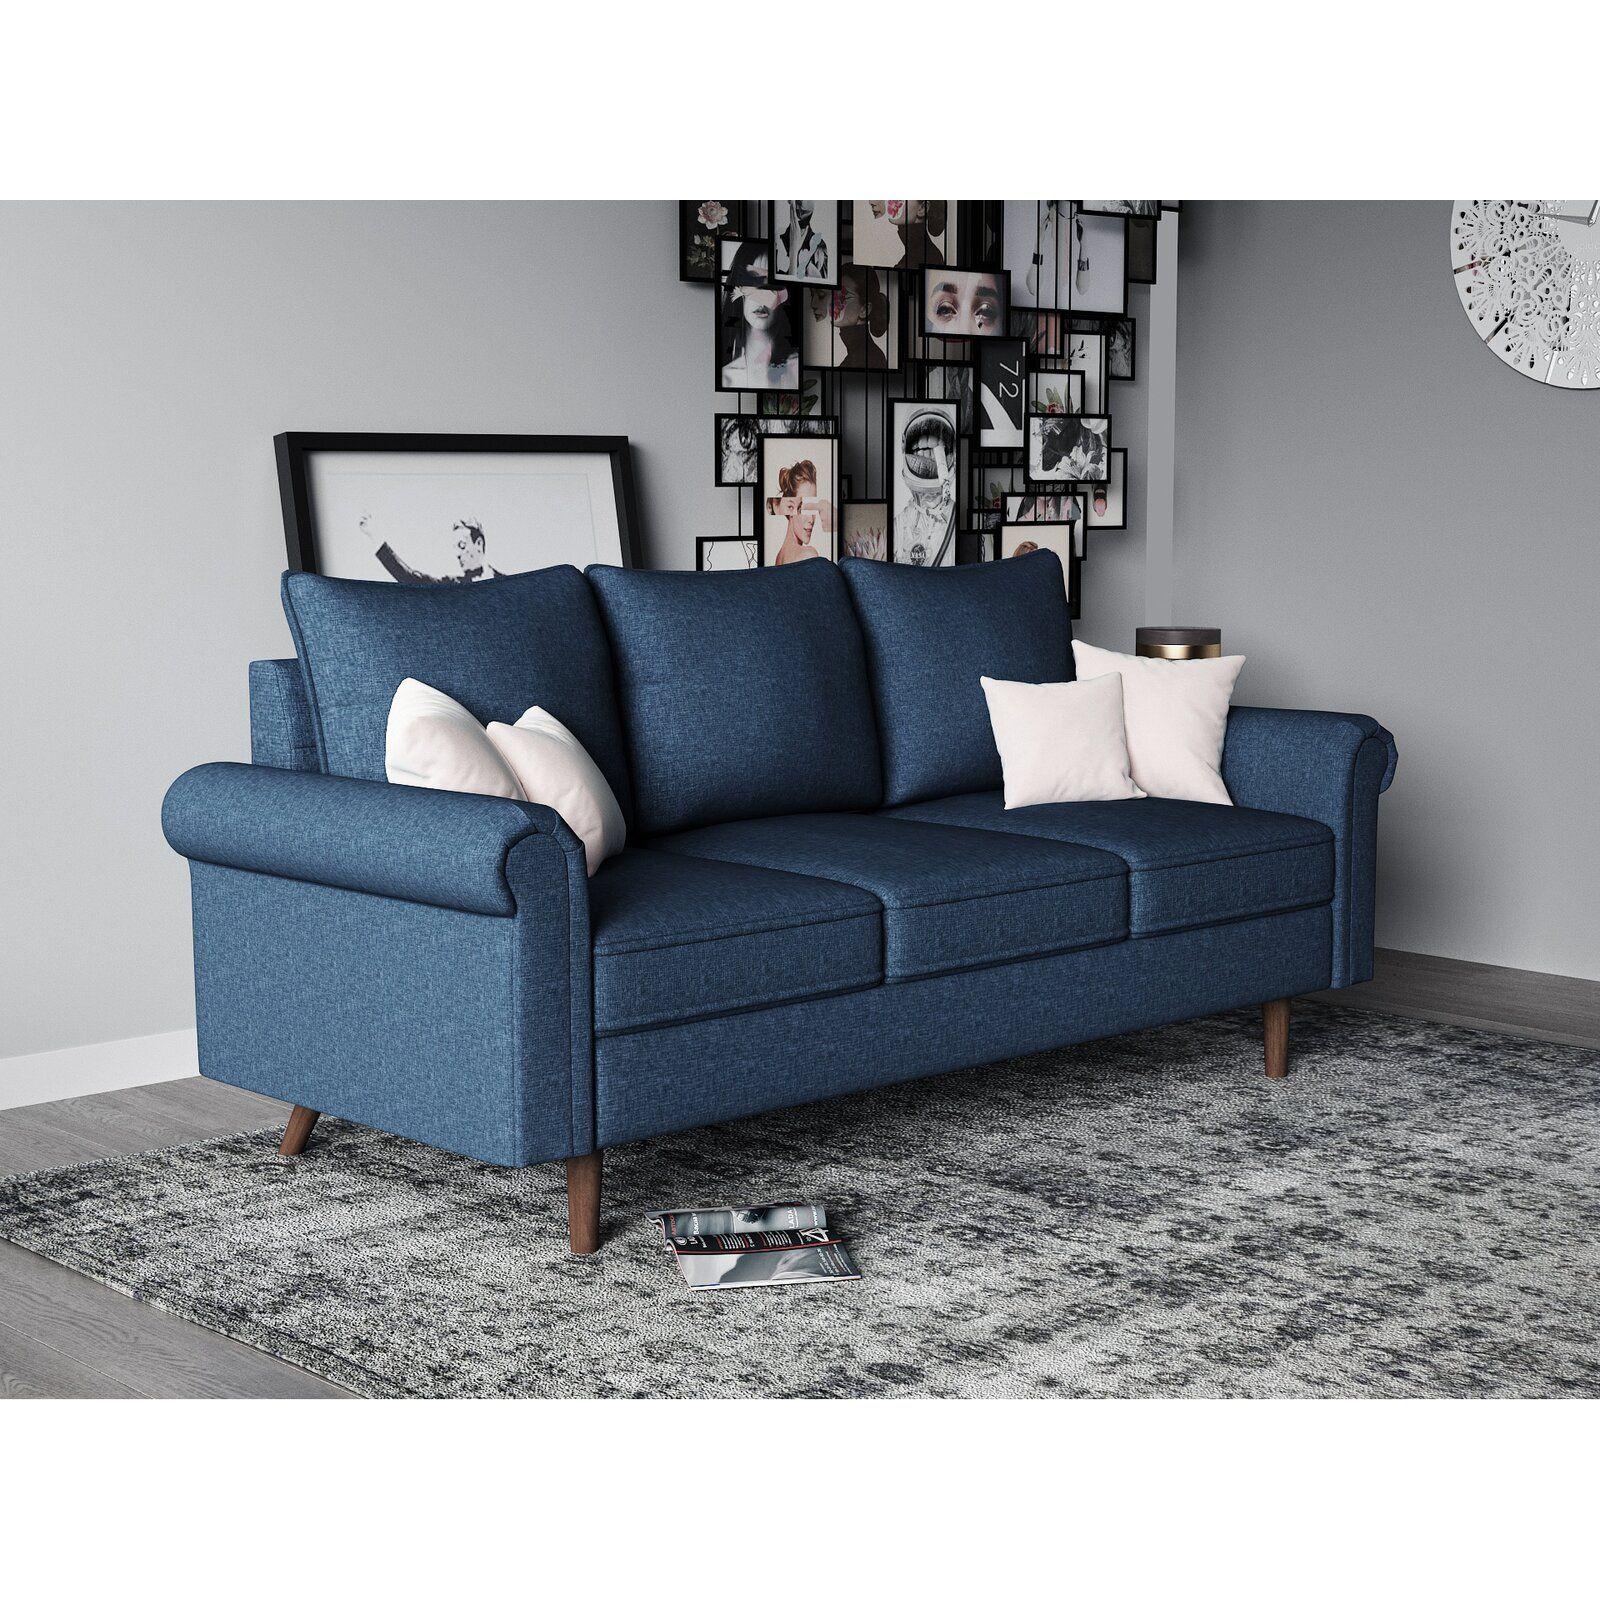 Magnificent Sakai Sofa Chris Sofa Furniture Sofa Upholstery Dailytribune Chair Design For Home Dailytribuneorg